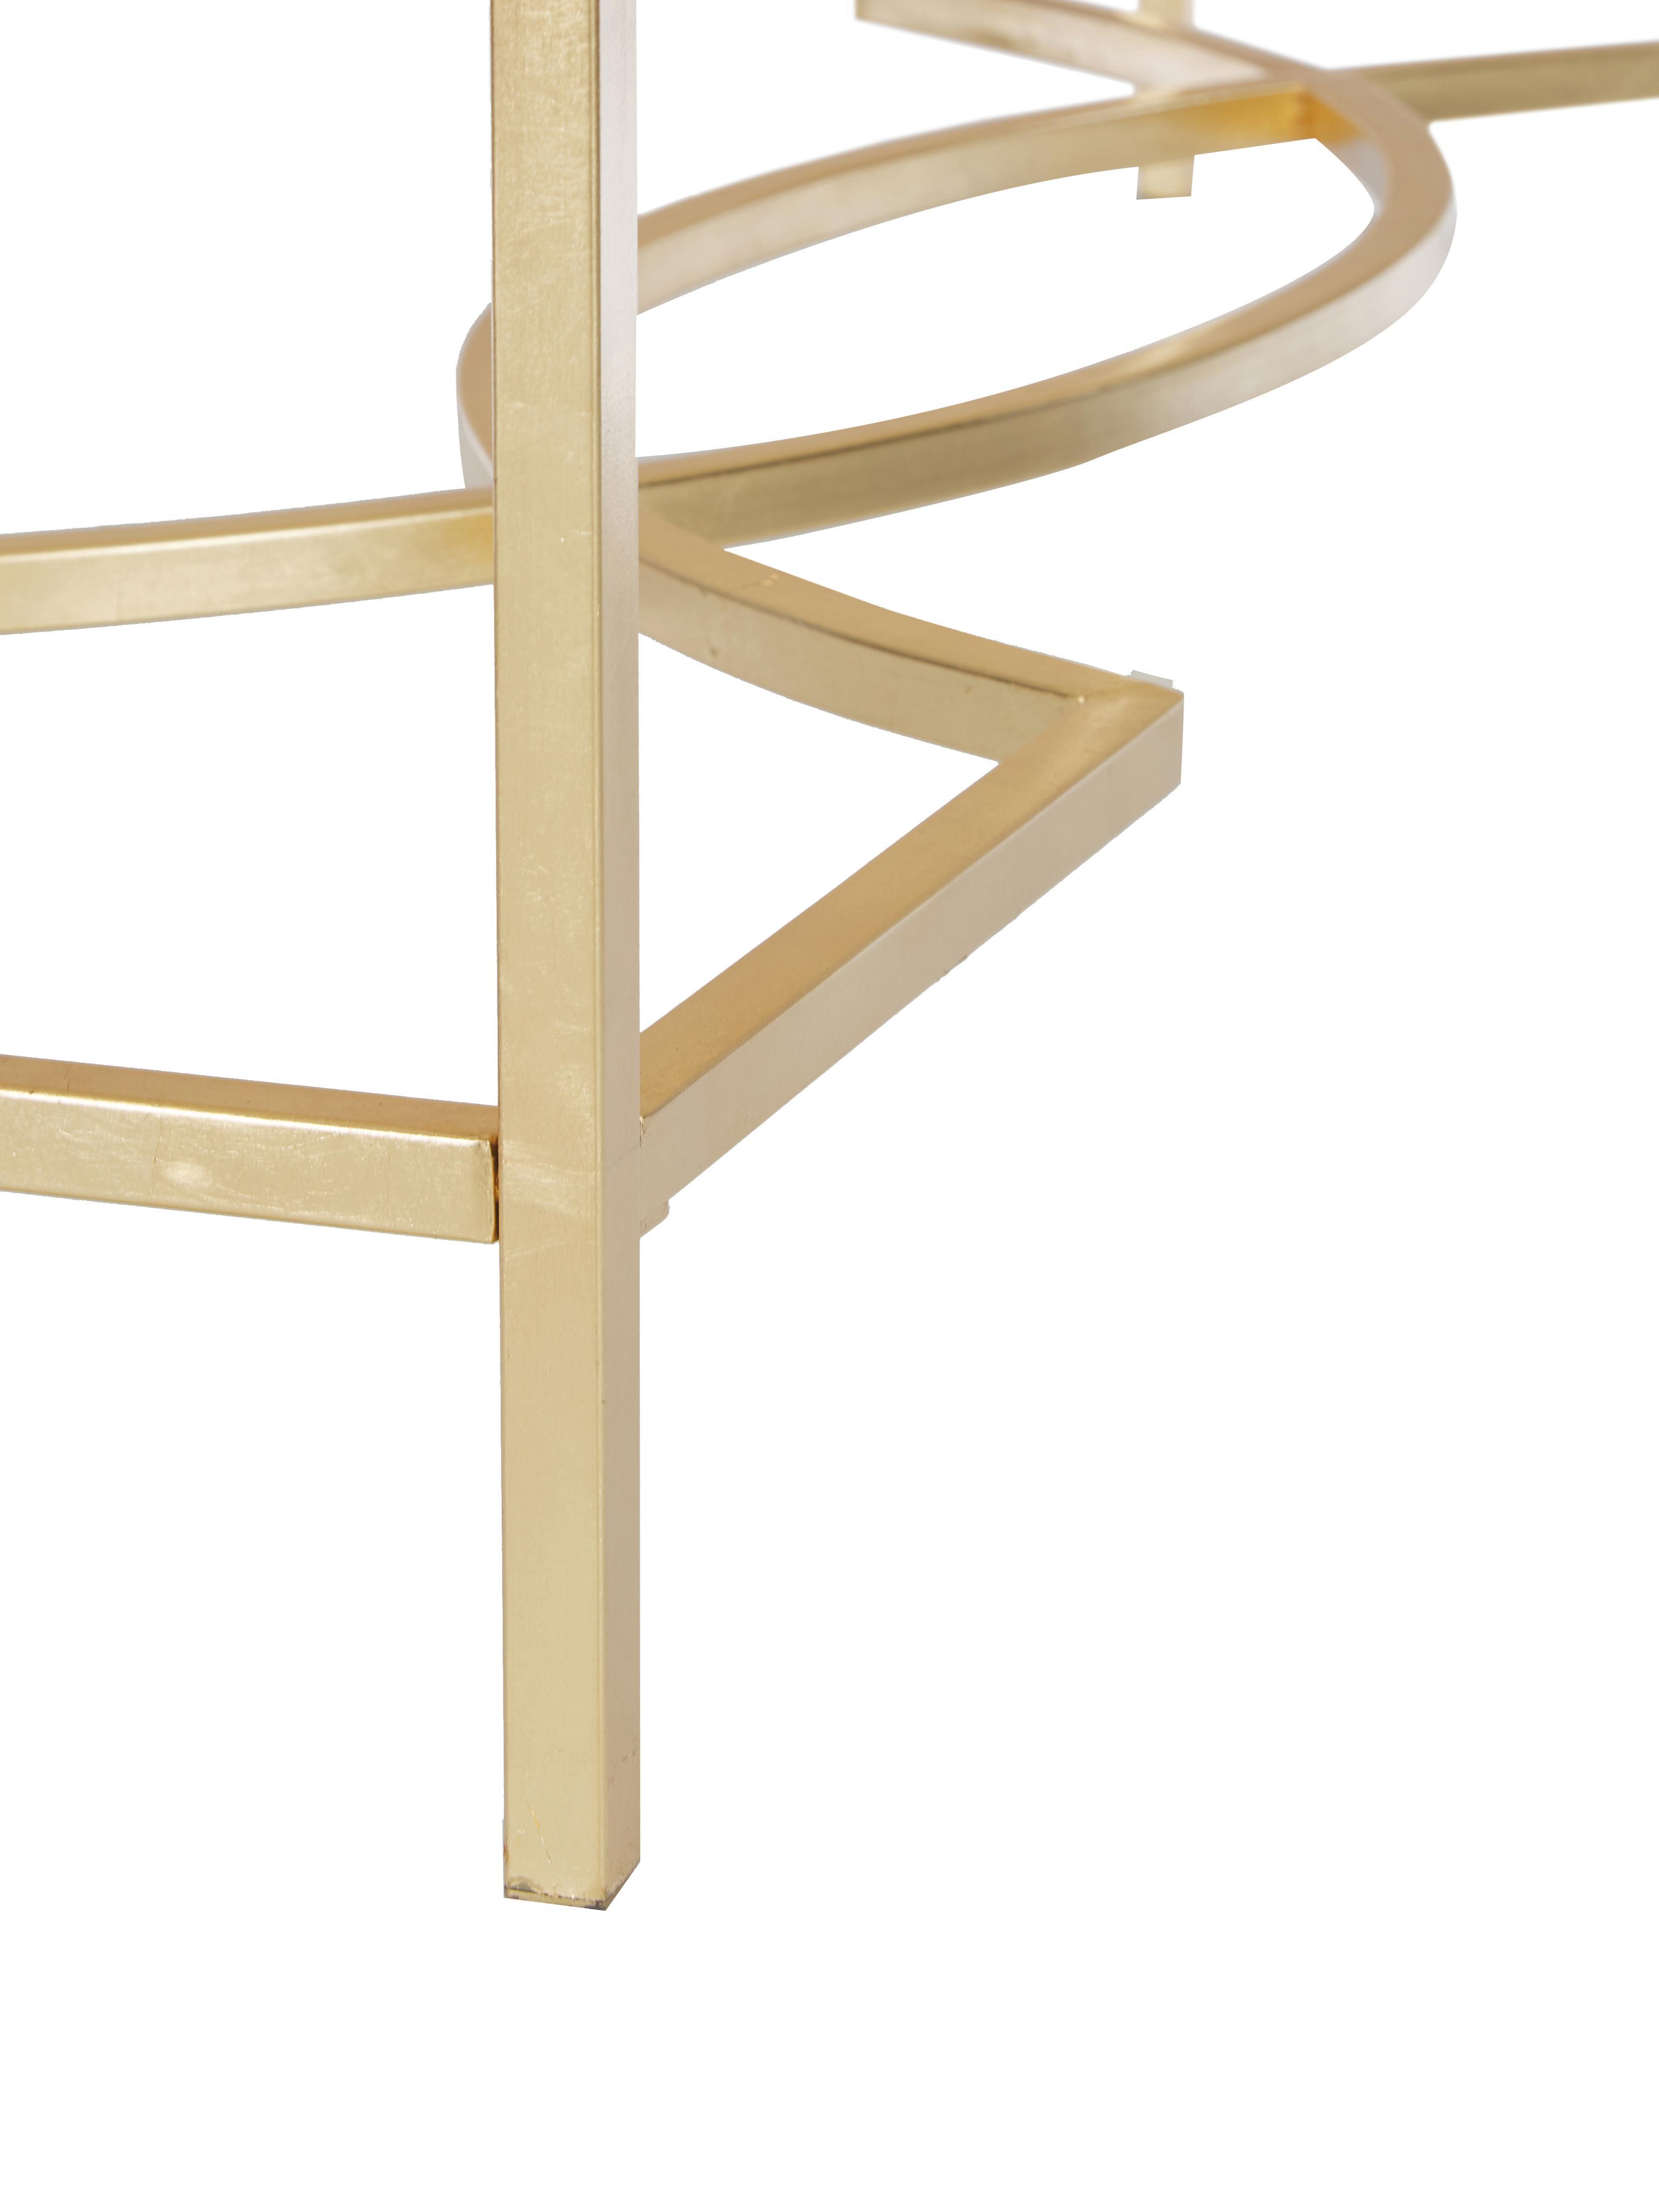 Konsole Sia mit Glasplatte, Gestell: Metall, lackiert, Platte: Glas, gehärtet, Gestell: GoldfarbenPlatte: Transparent, B 160 x T 40 cm